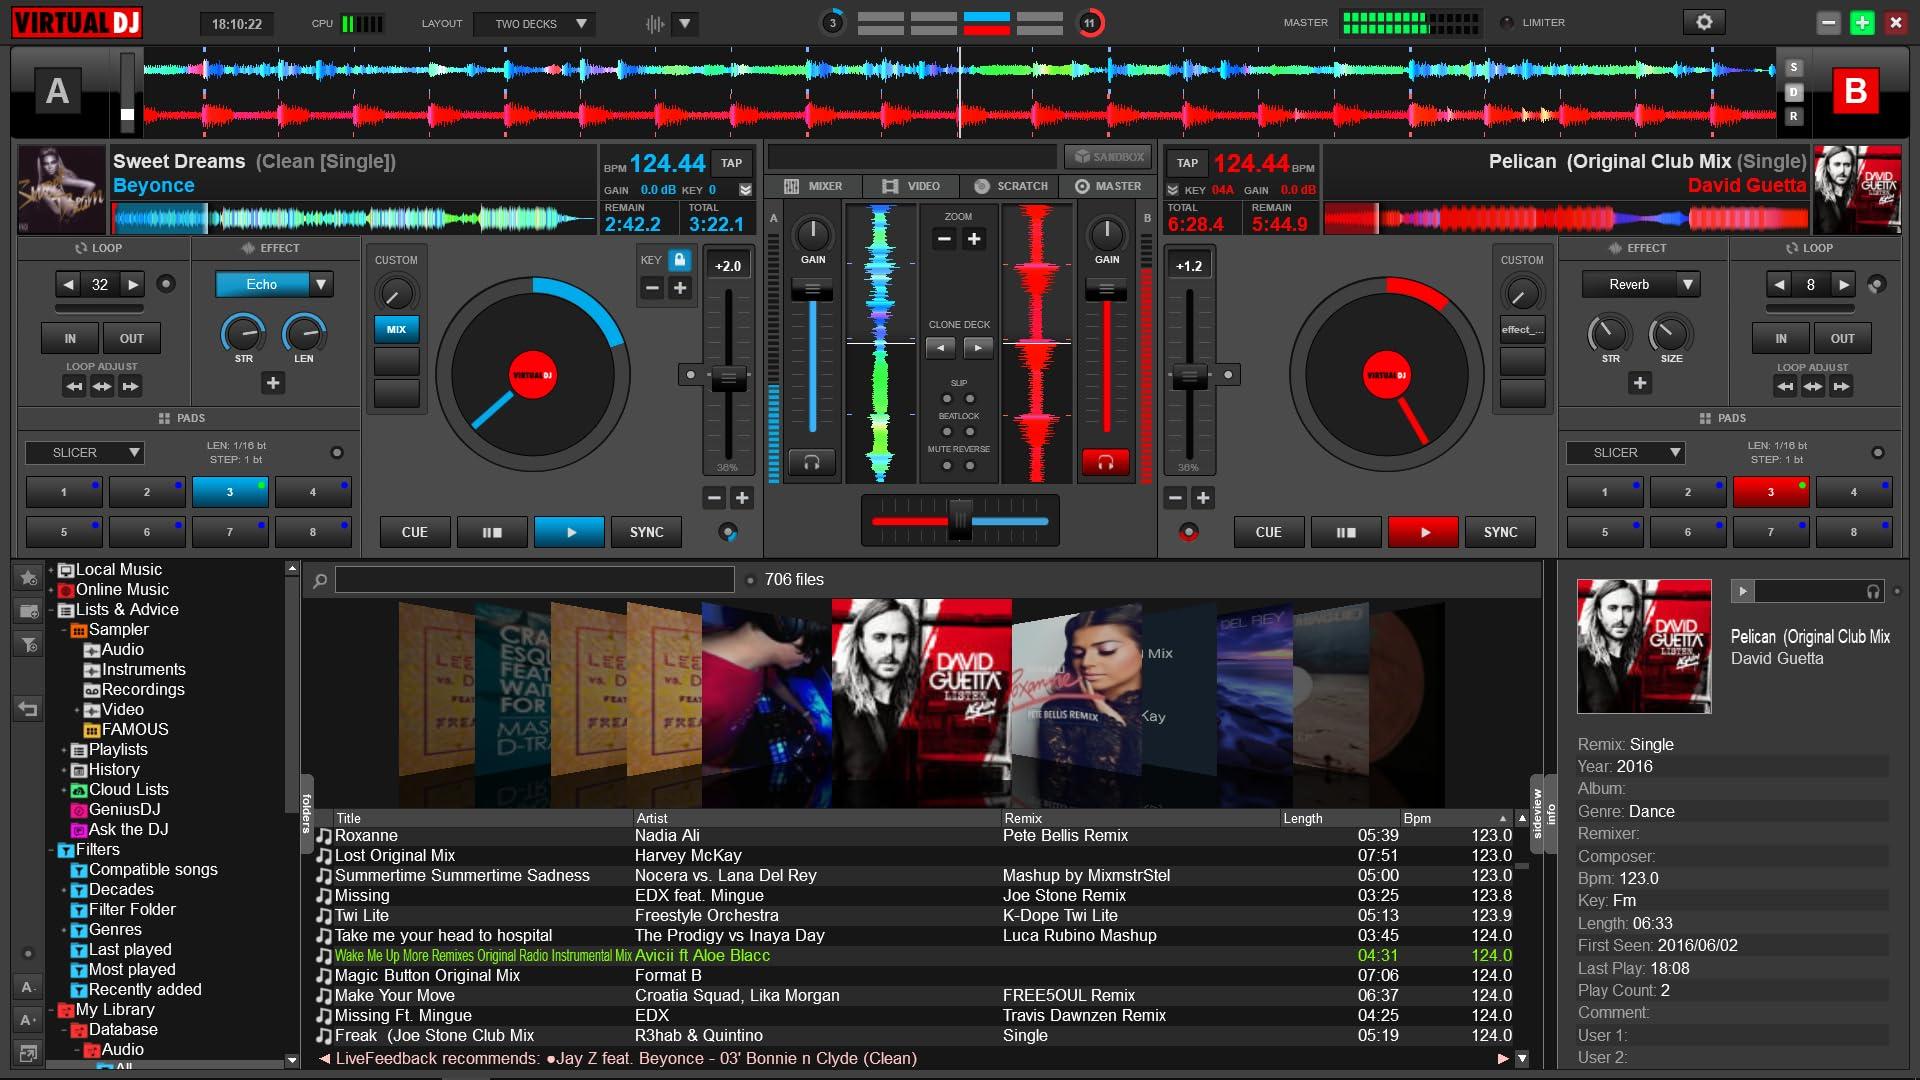 TÉLÉCHARGER BRUITAGE VIRTUAL DJ